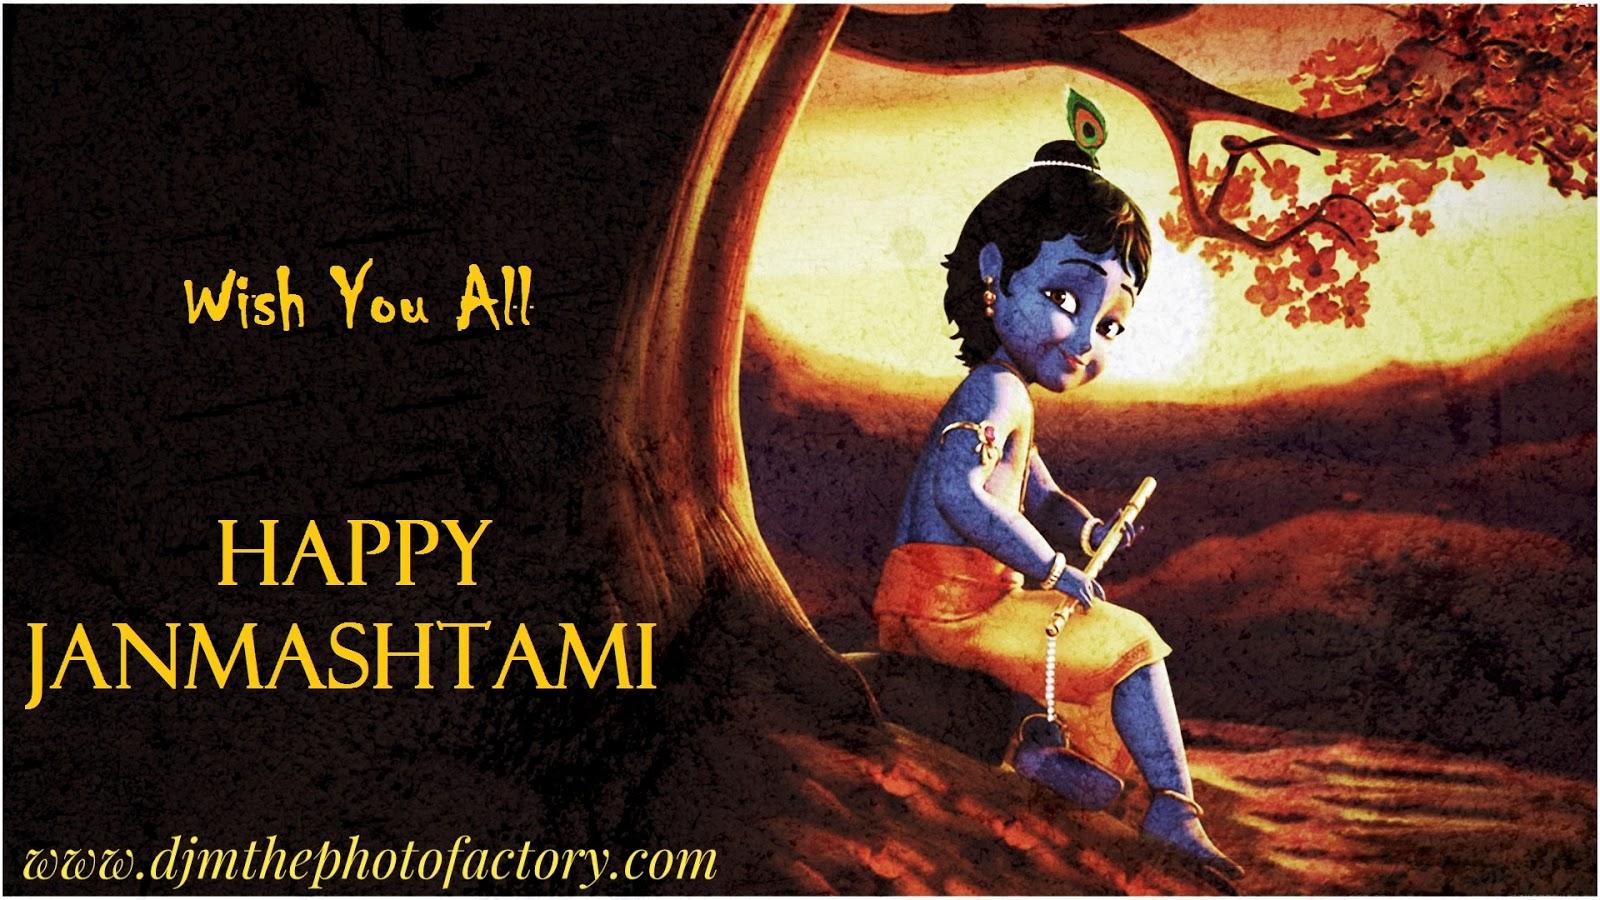 Happy Janmashtami 2019 Wishes Images, Quotes,  WhatsApp Status